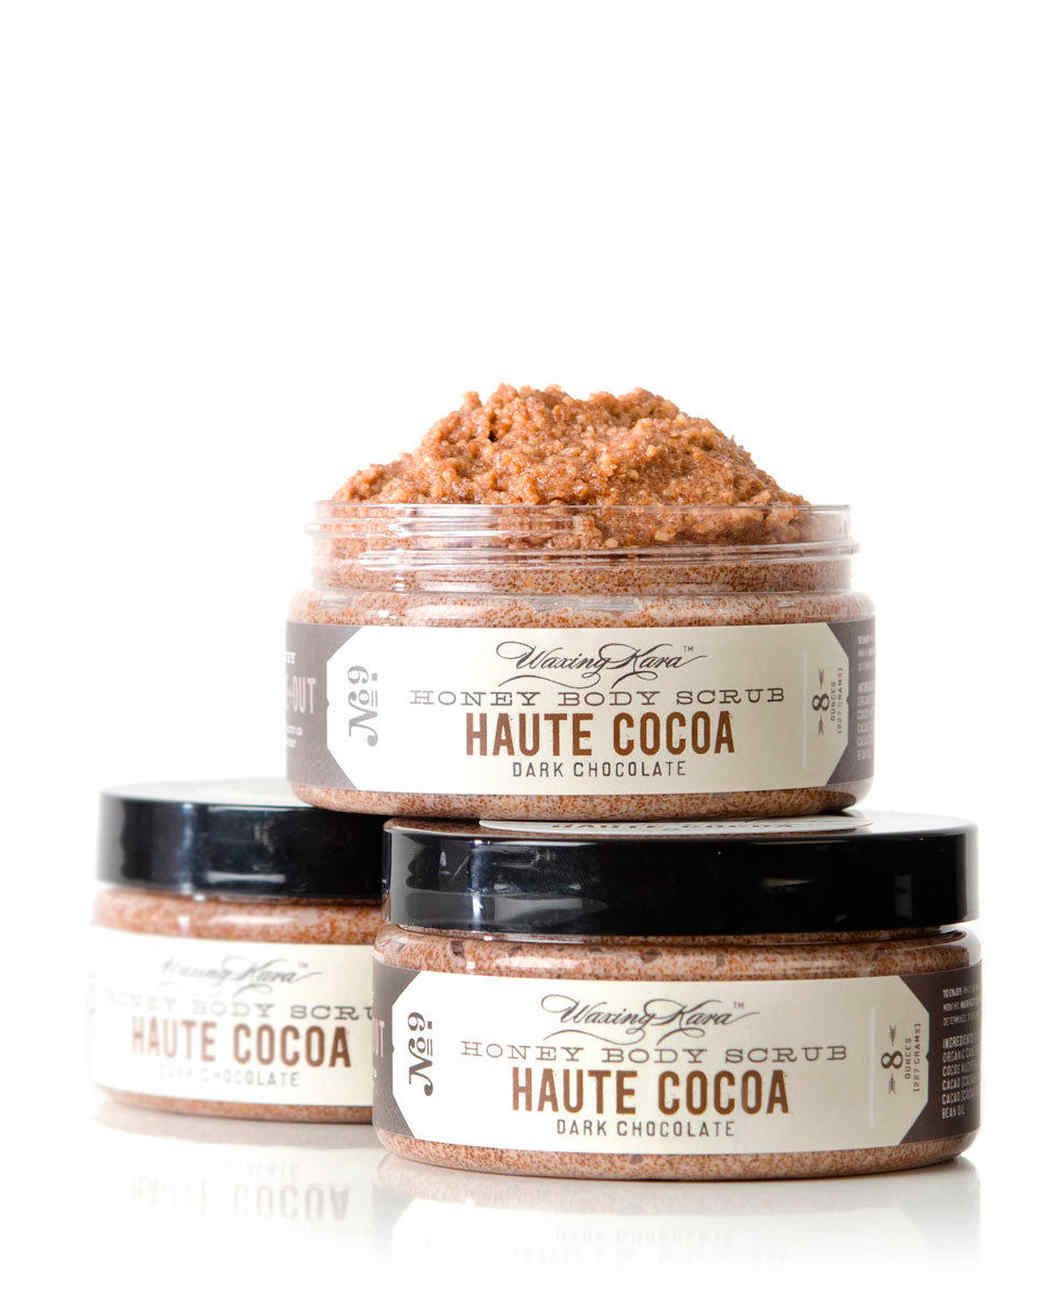 waxing-kara-honey-body-scrub-haute-cocoa-0915.jpg